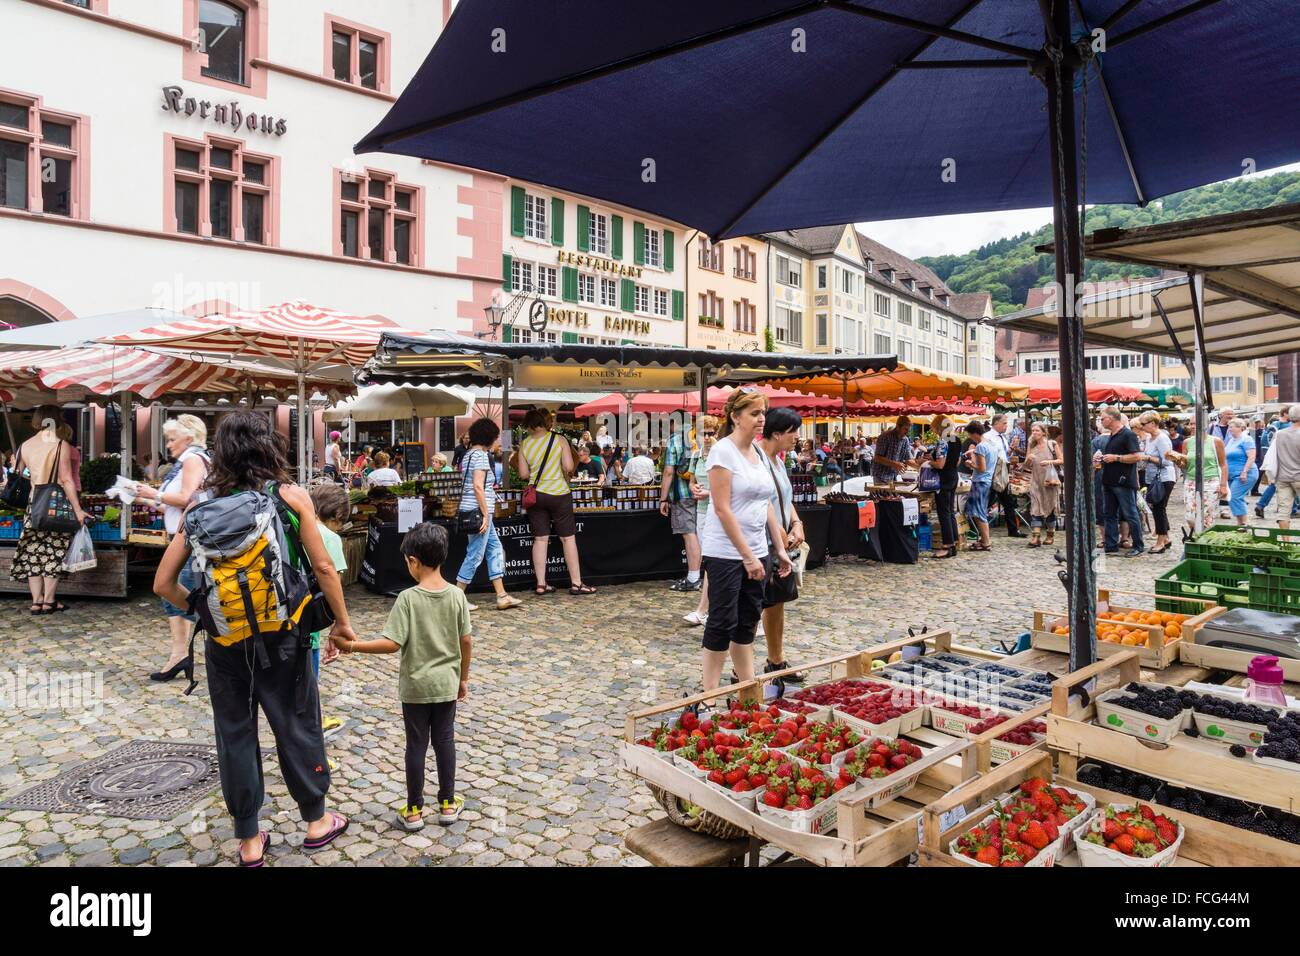 mercado al aire libre m nsterplattz friburgo de On piedra para el mercado al aire libre